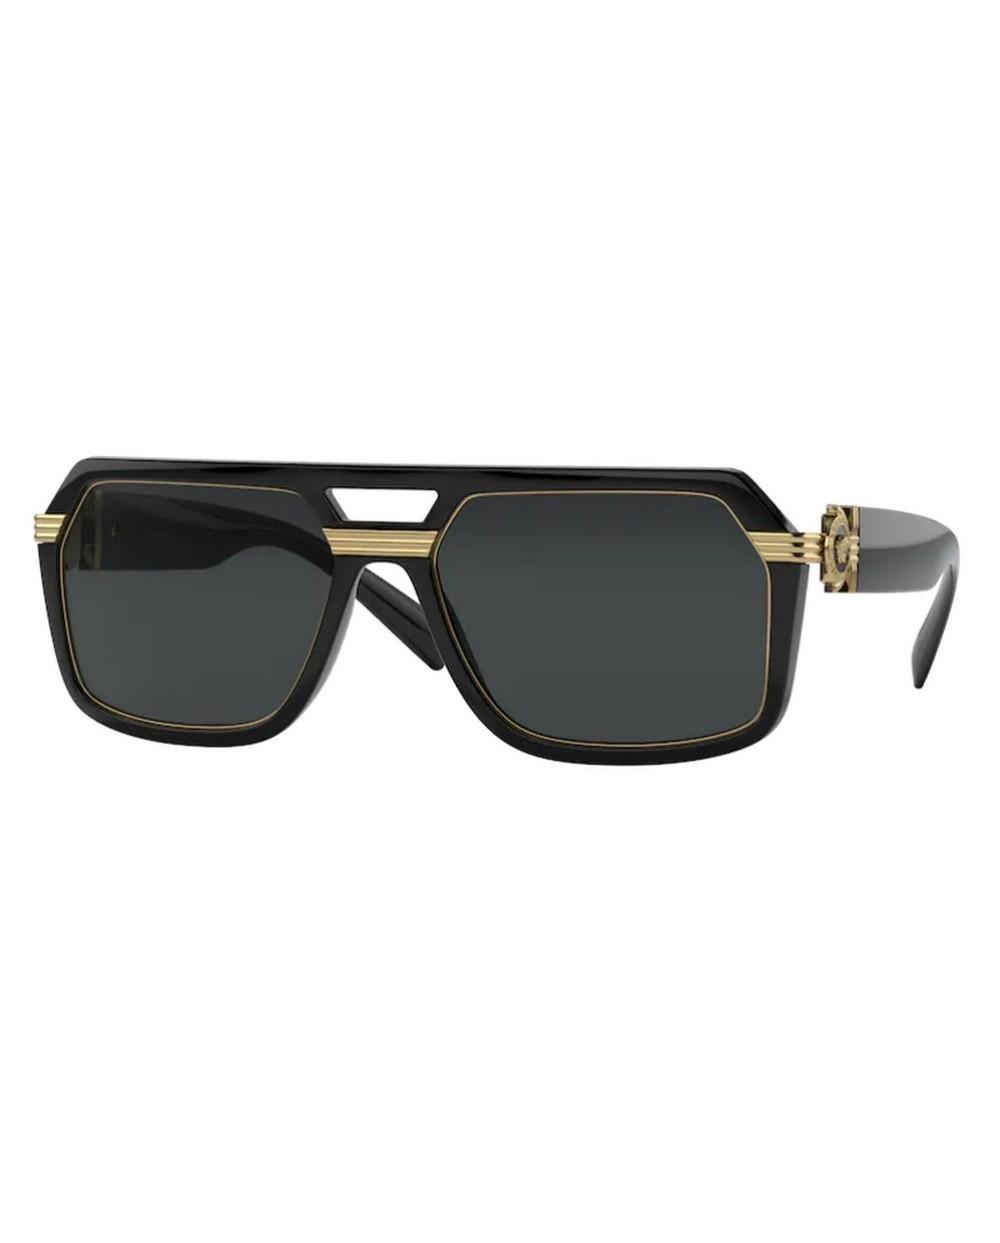 Occhiale da sole Versace VE 4399 originale garanzia italia